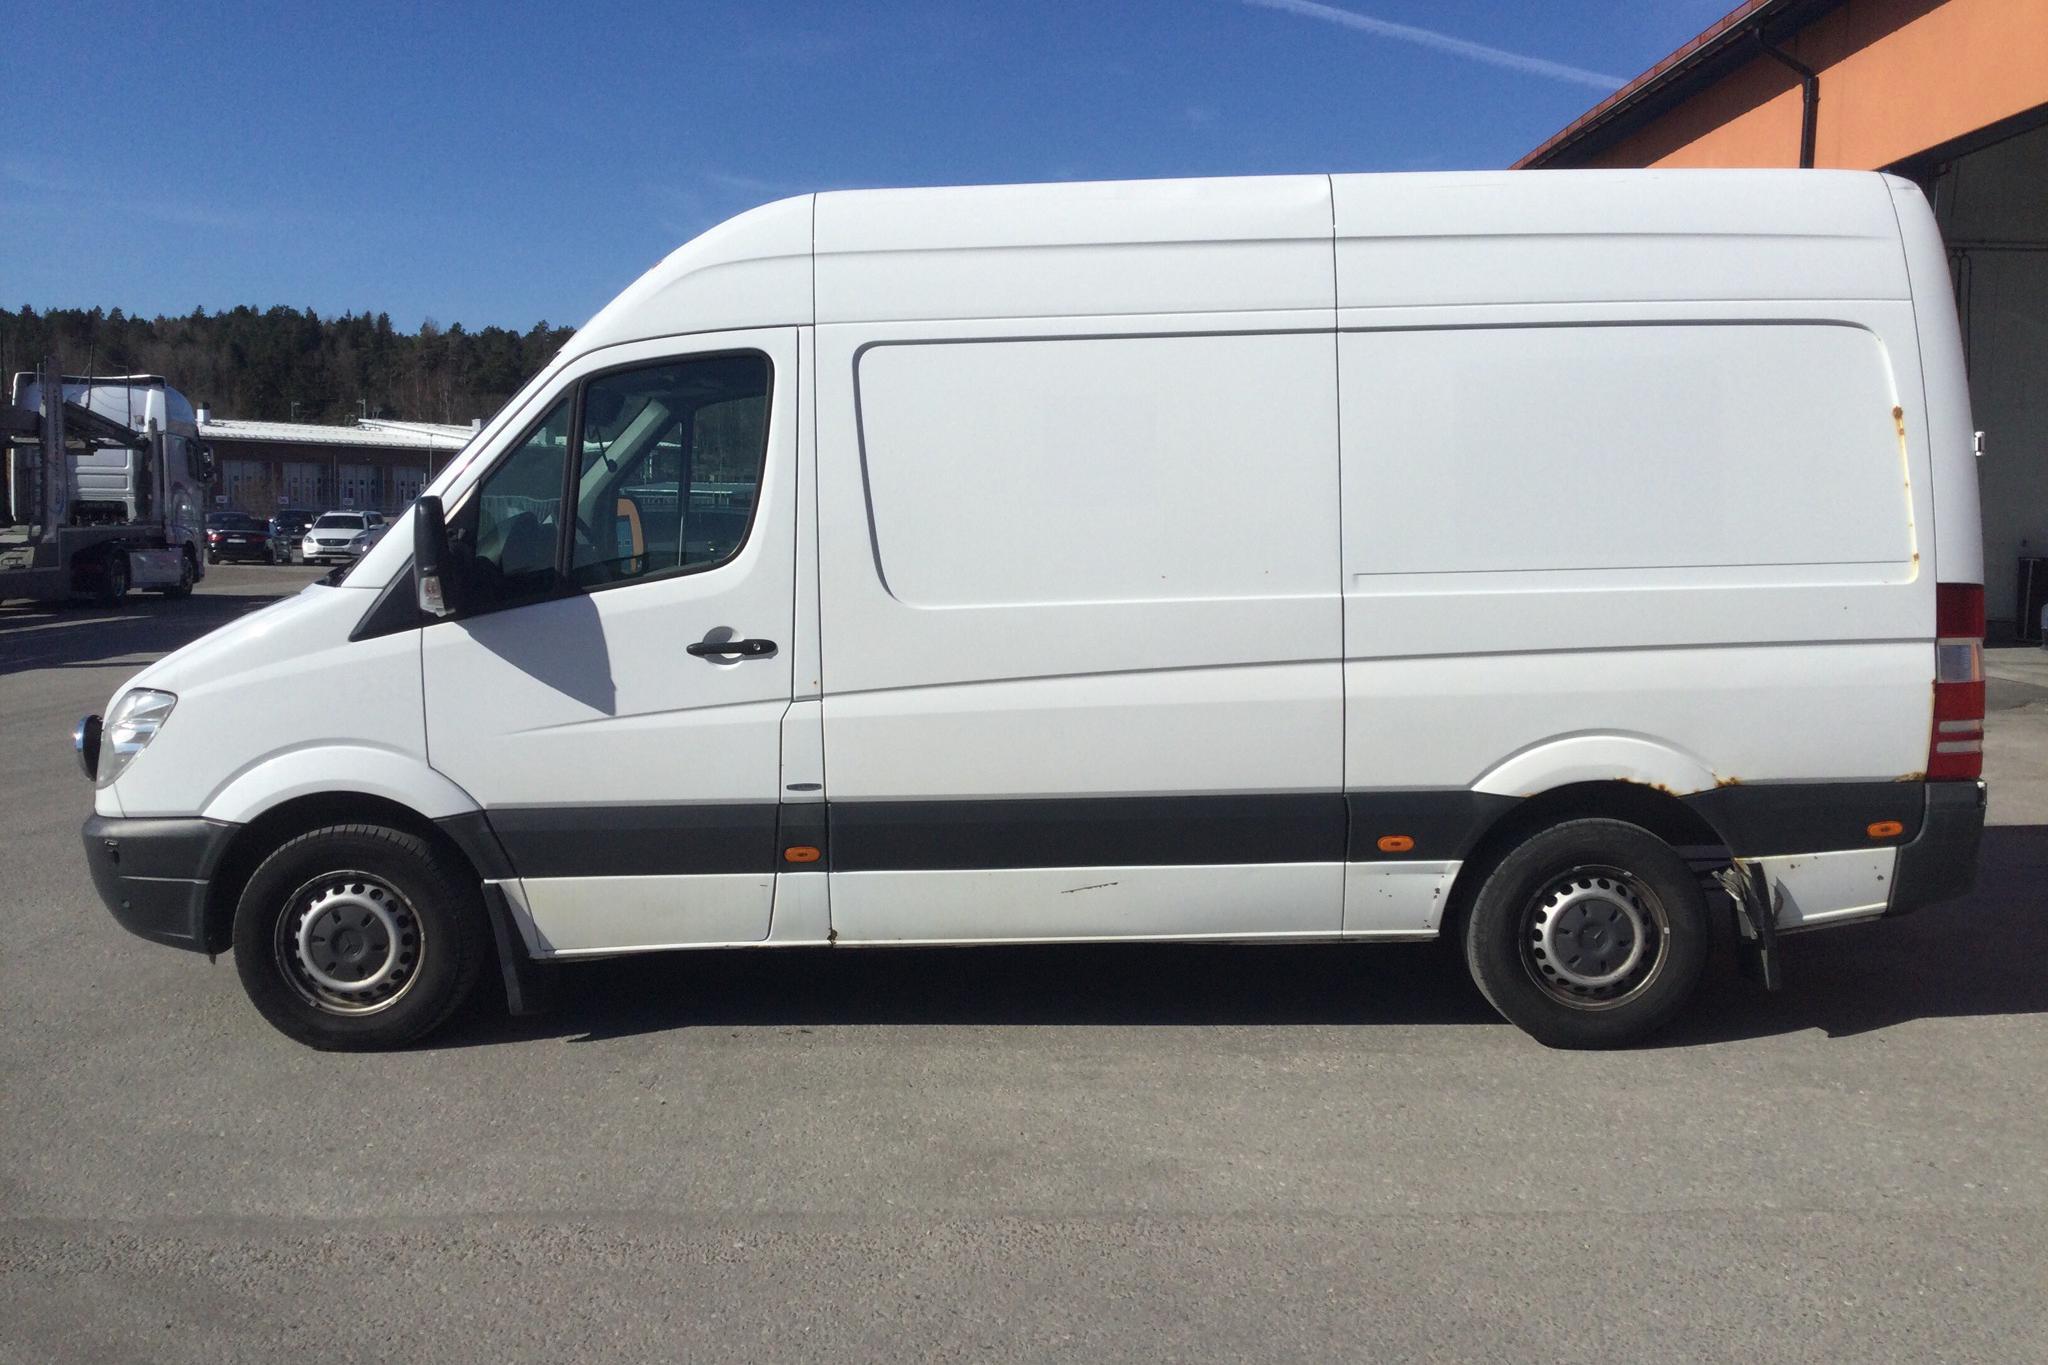 Mercedes Sprinter 316 CDI (163hk) - 550 130 km - Automatic - white - 2013